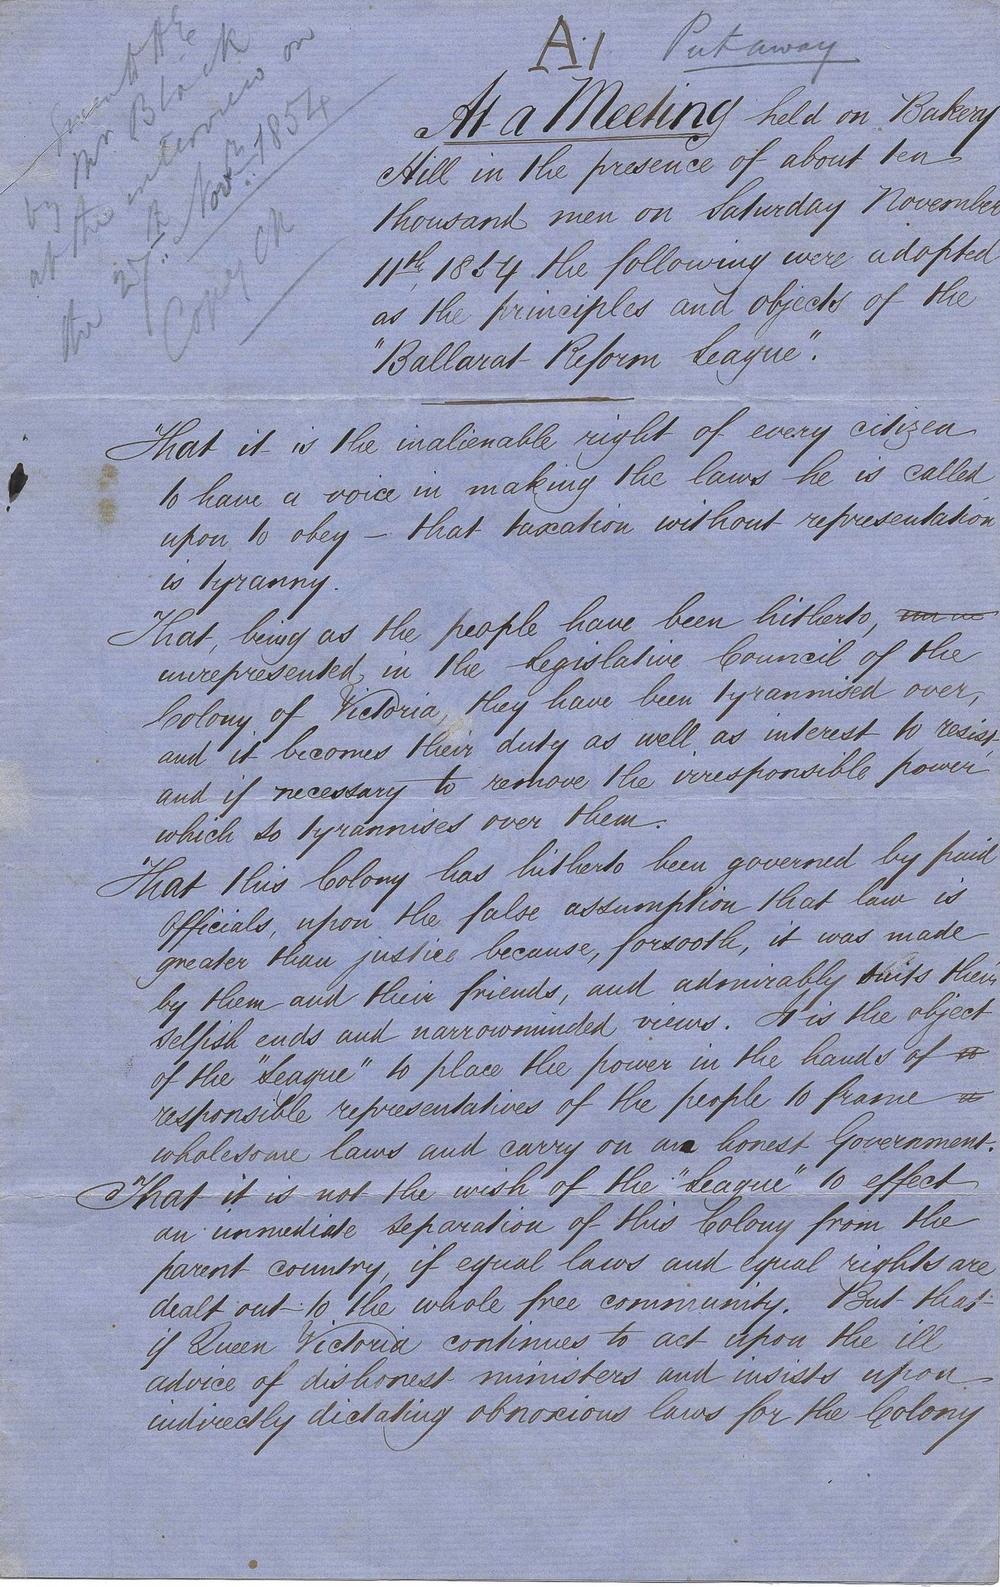 PROV, VPRS 4066/P0/Unit 1/Nov No.69 Ballarat Reform League Charter